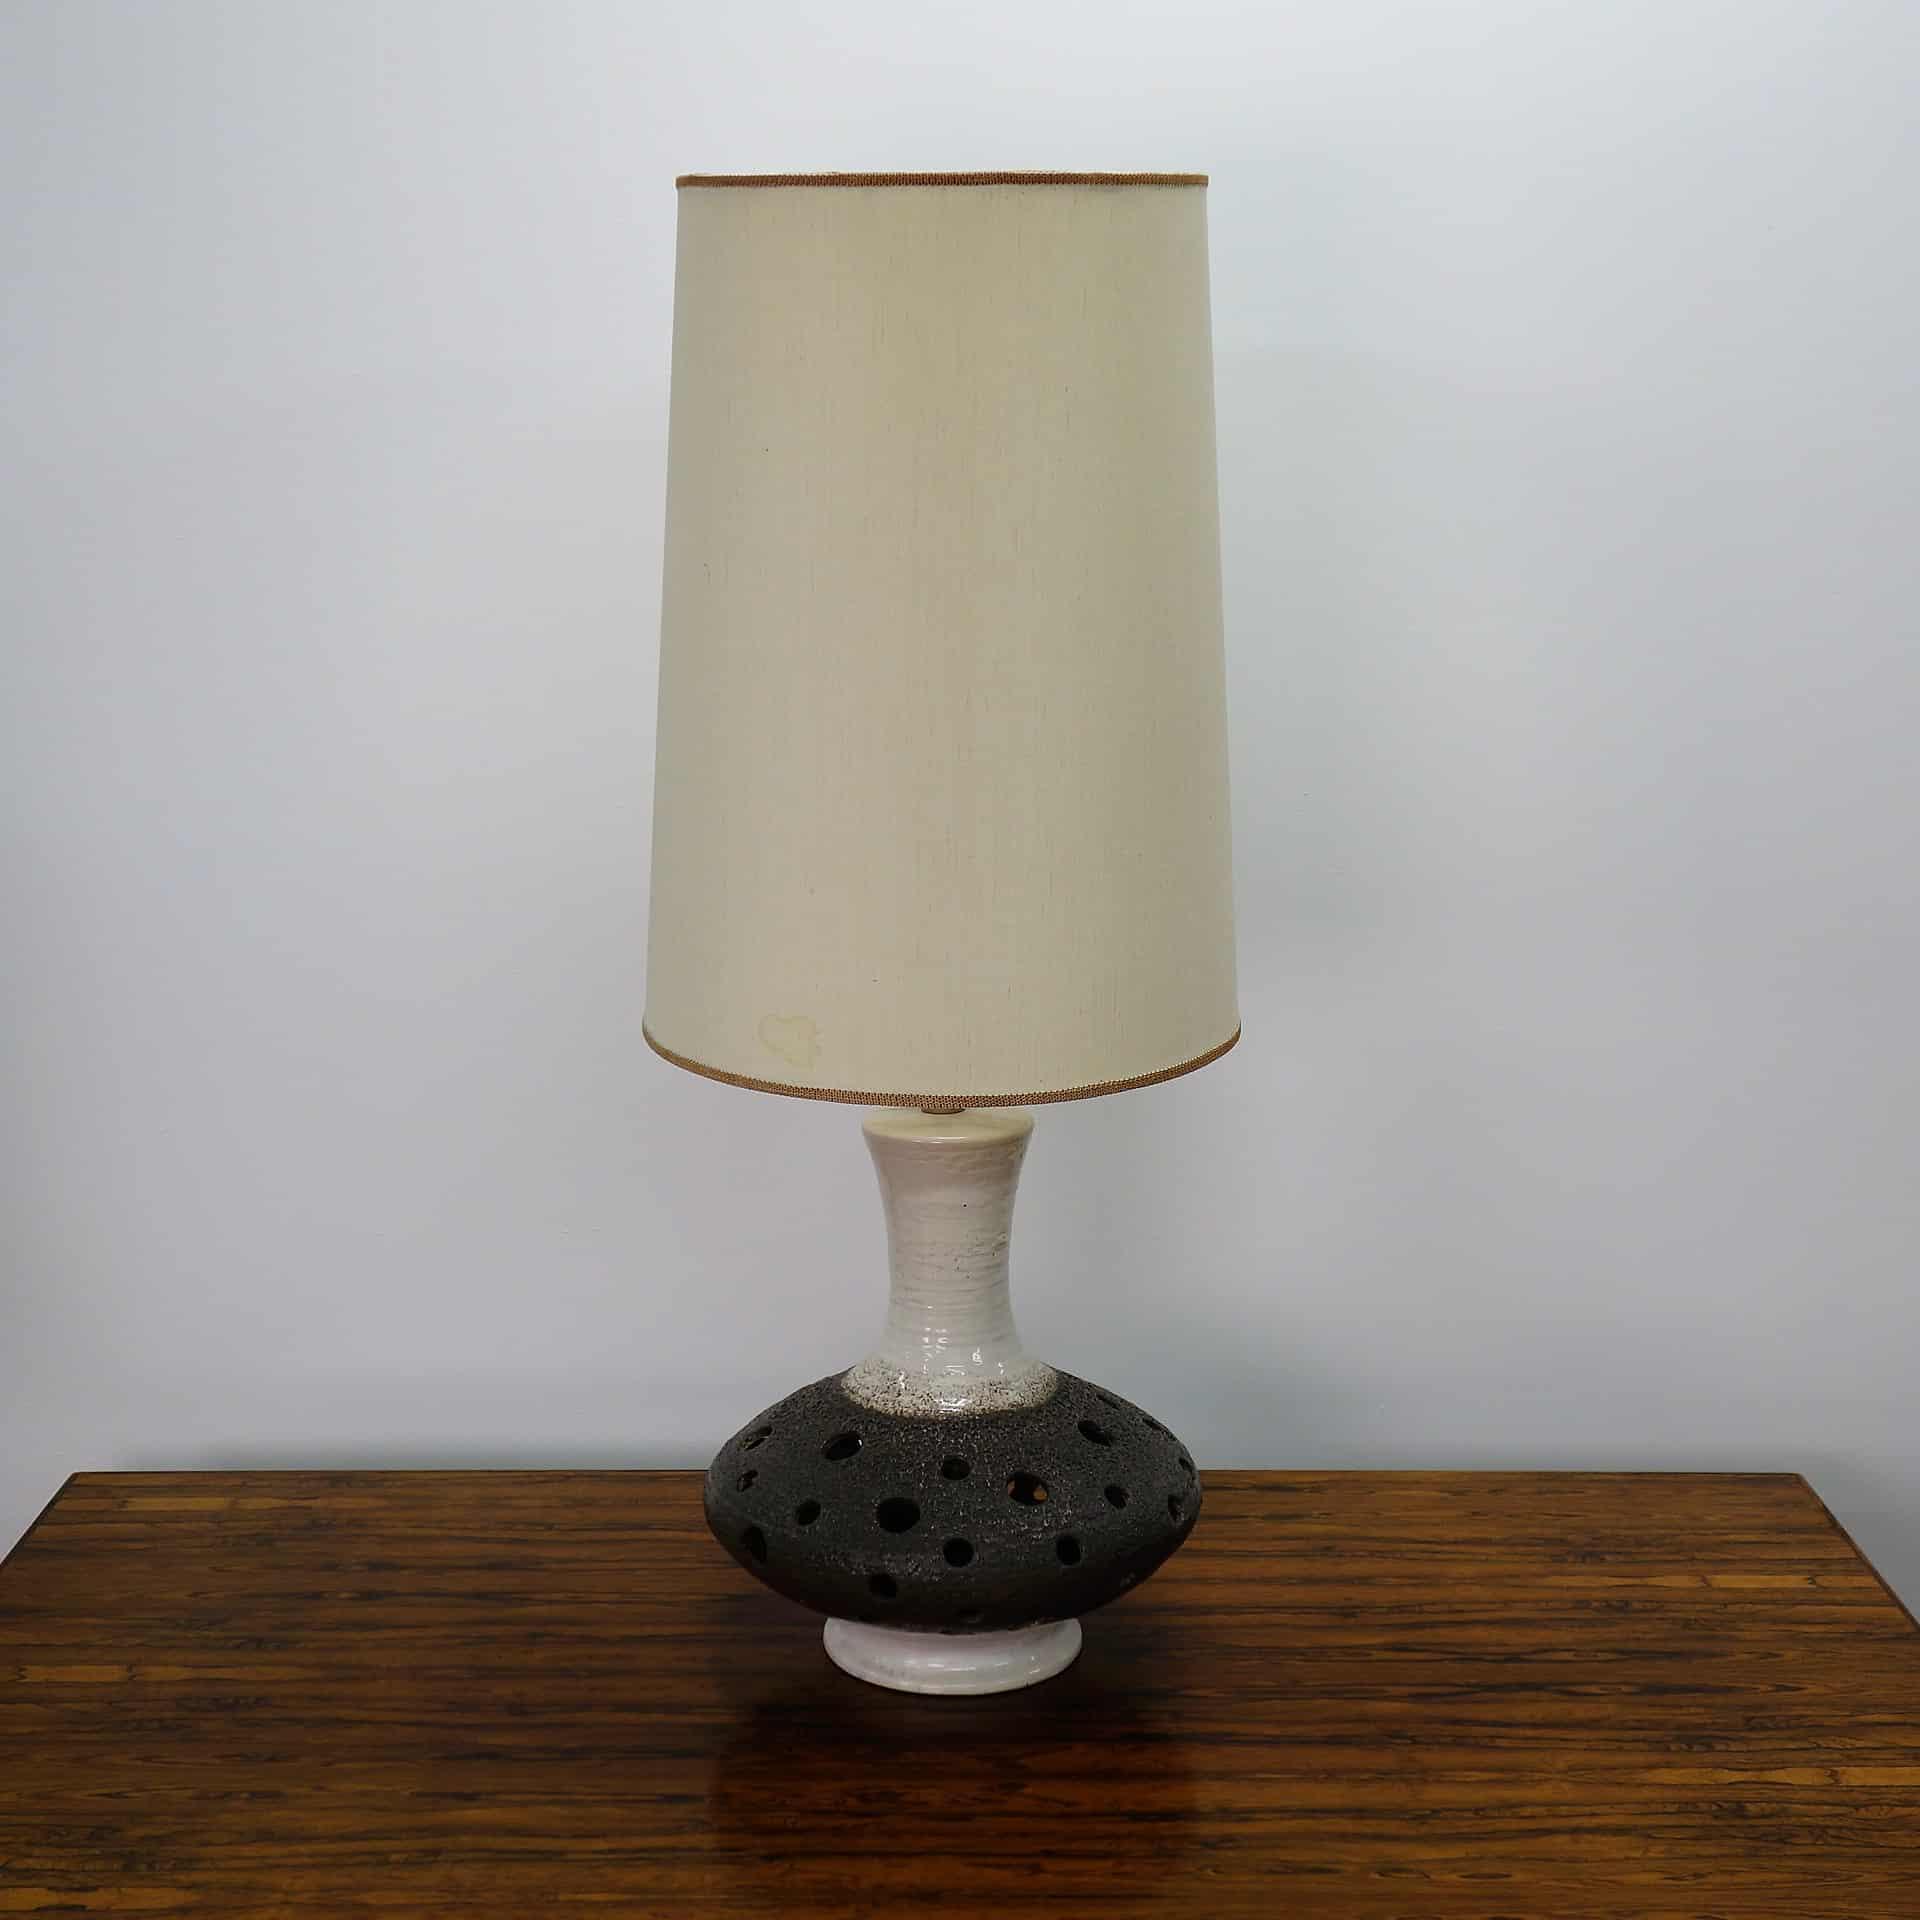 1970s West German pierced tall table lamp